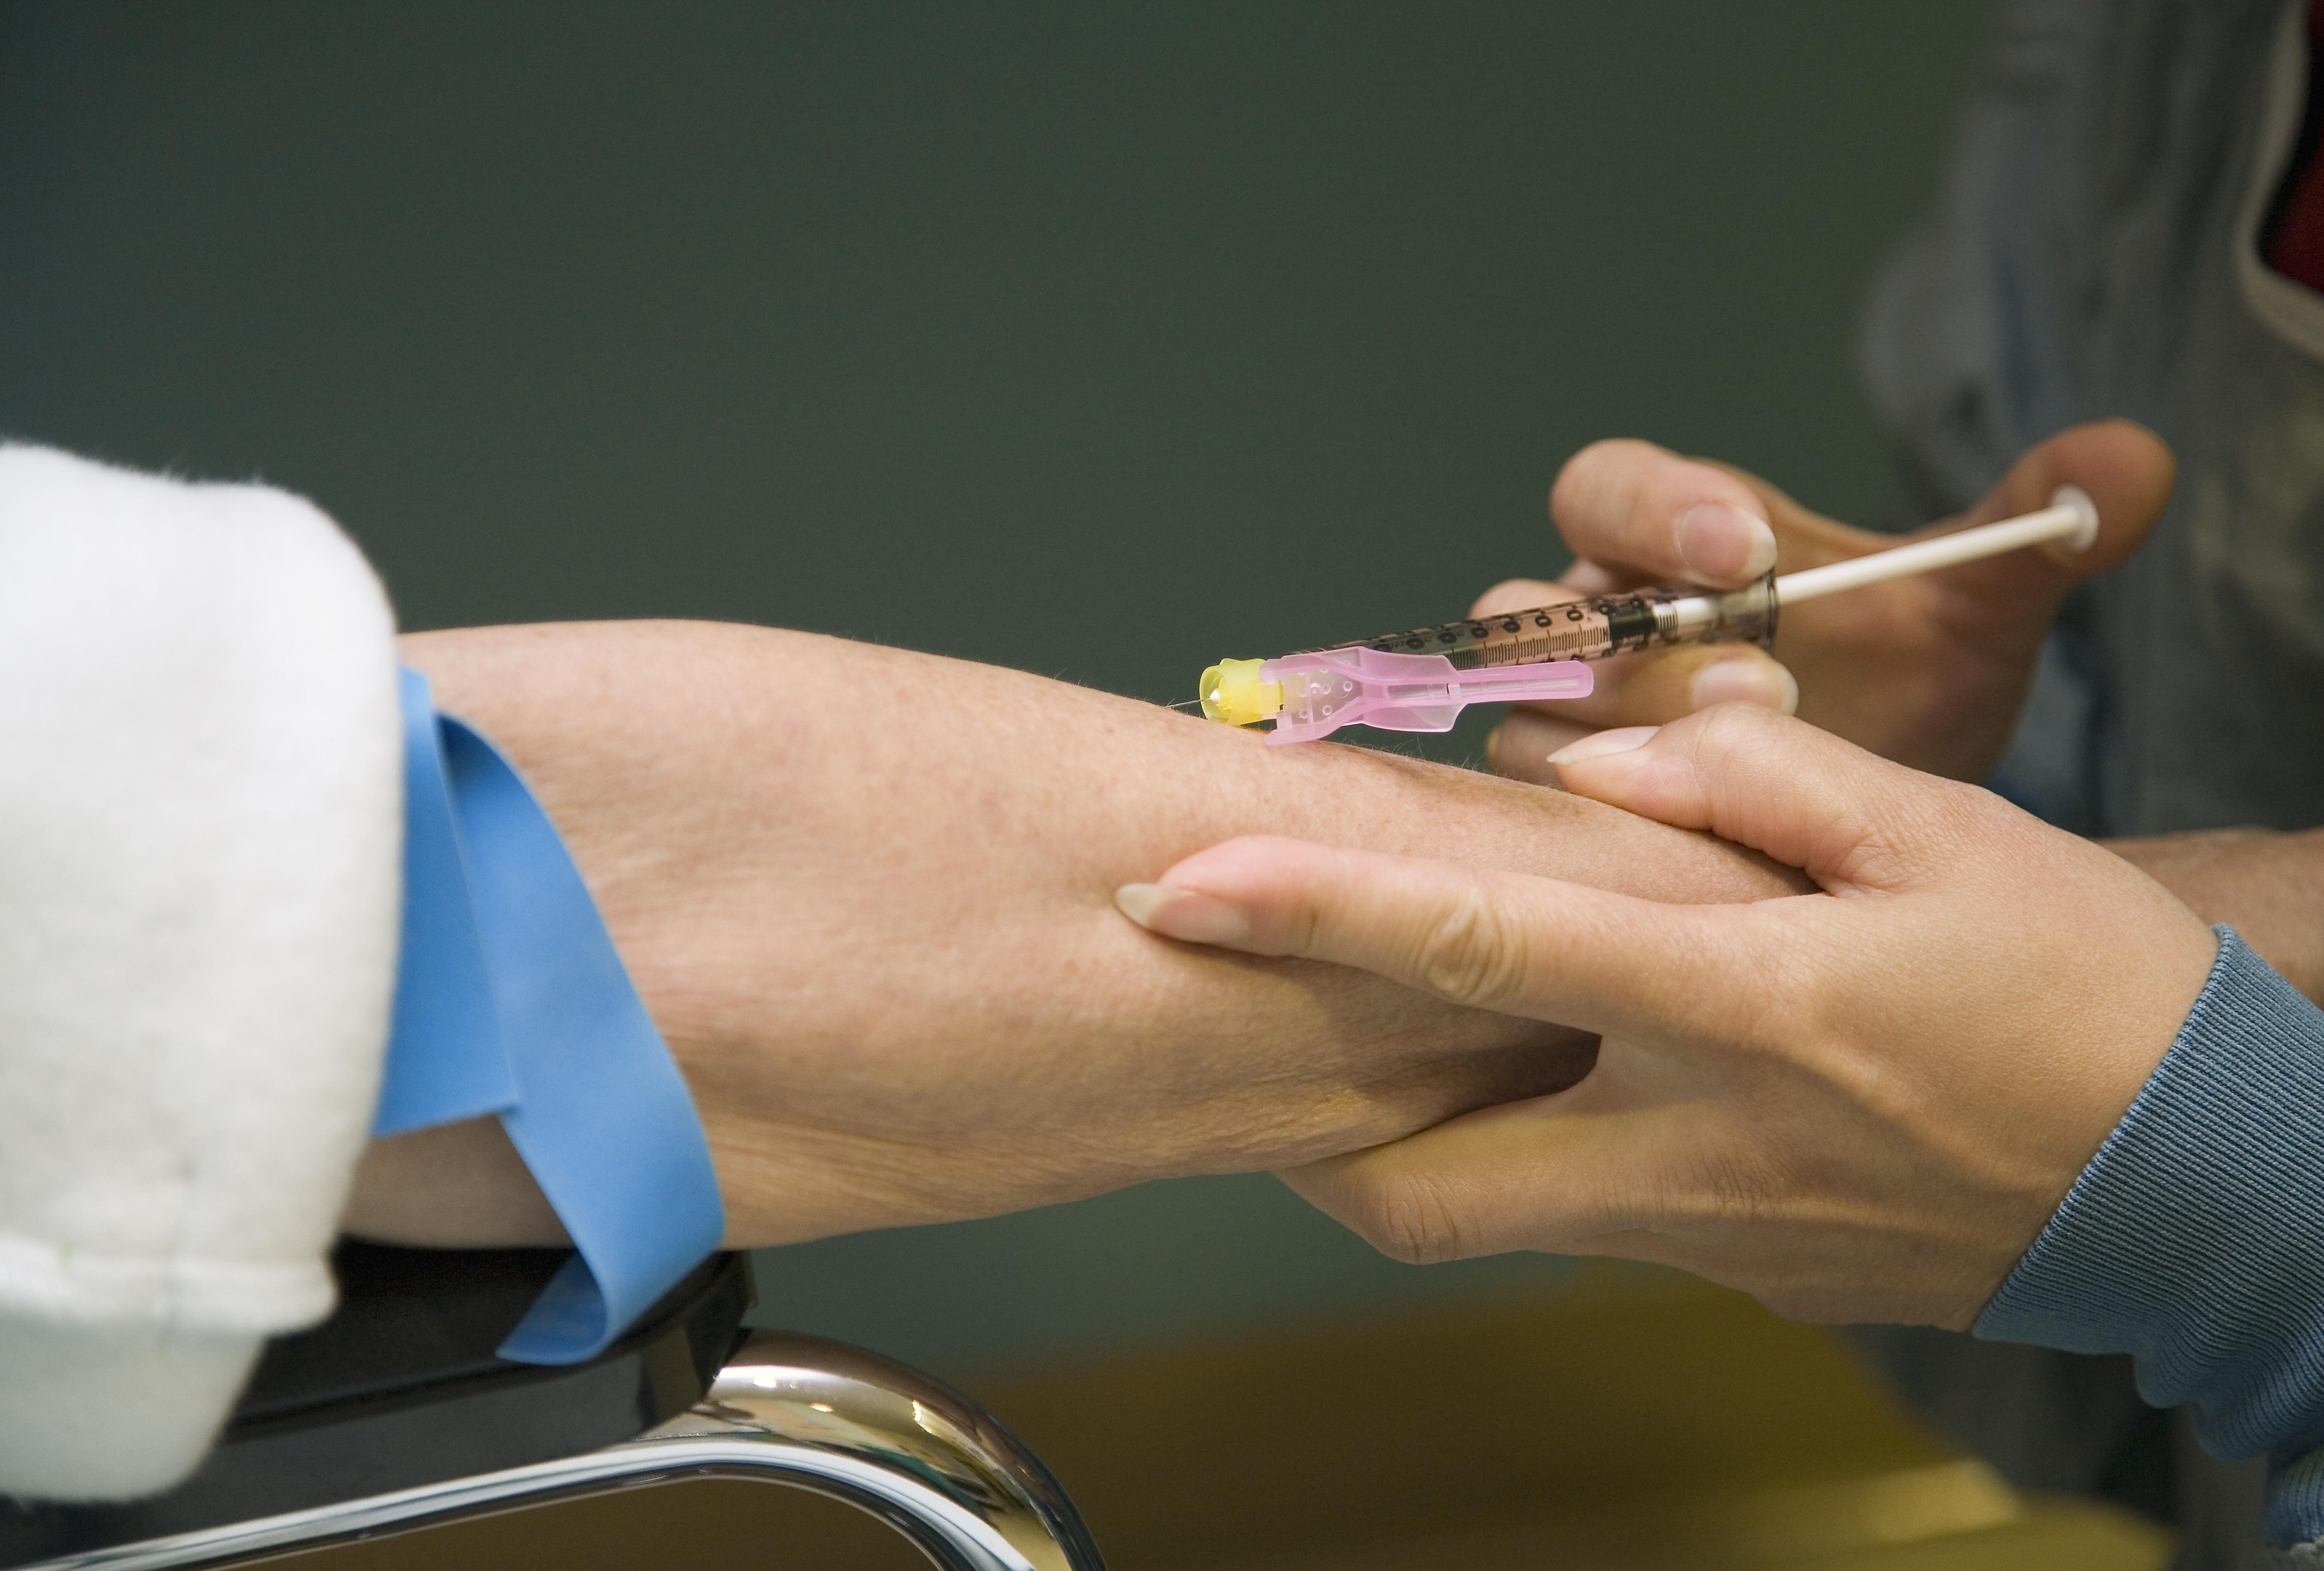 preventing needlestick injuries training